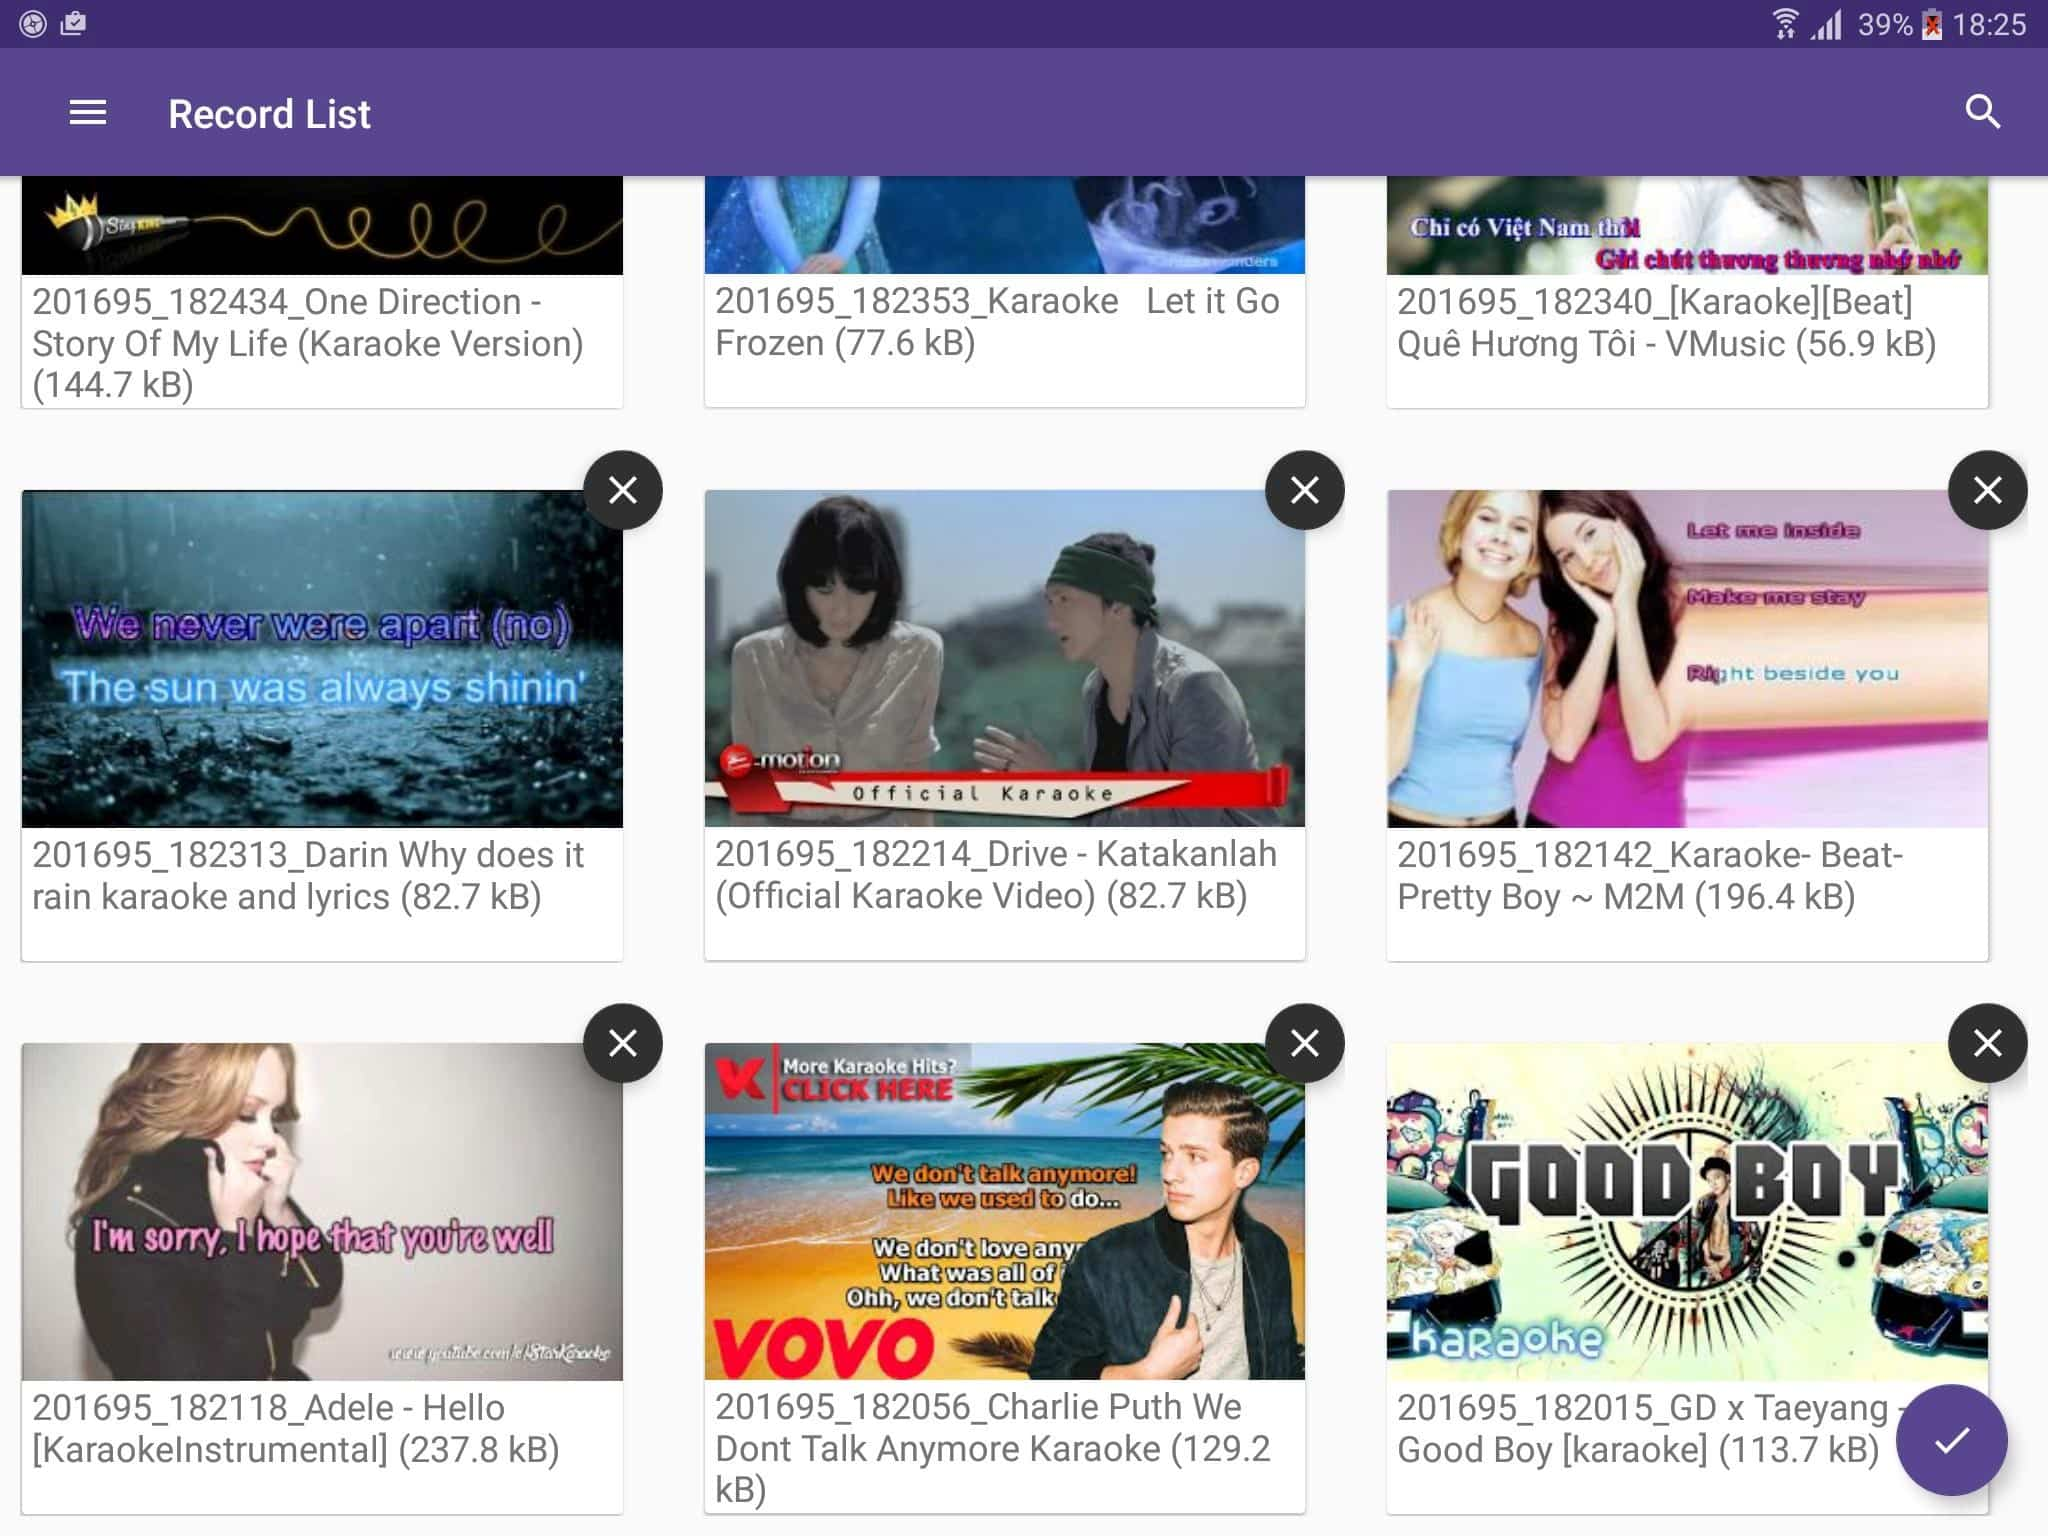 Karaoke Secara Online: Record - Aloha Std